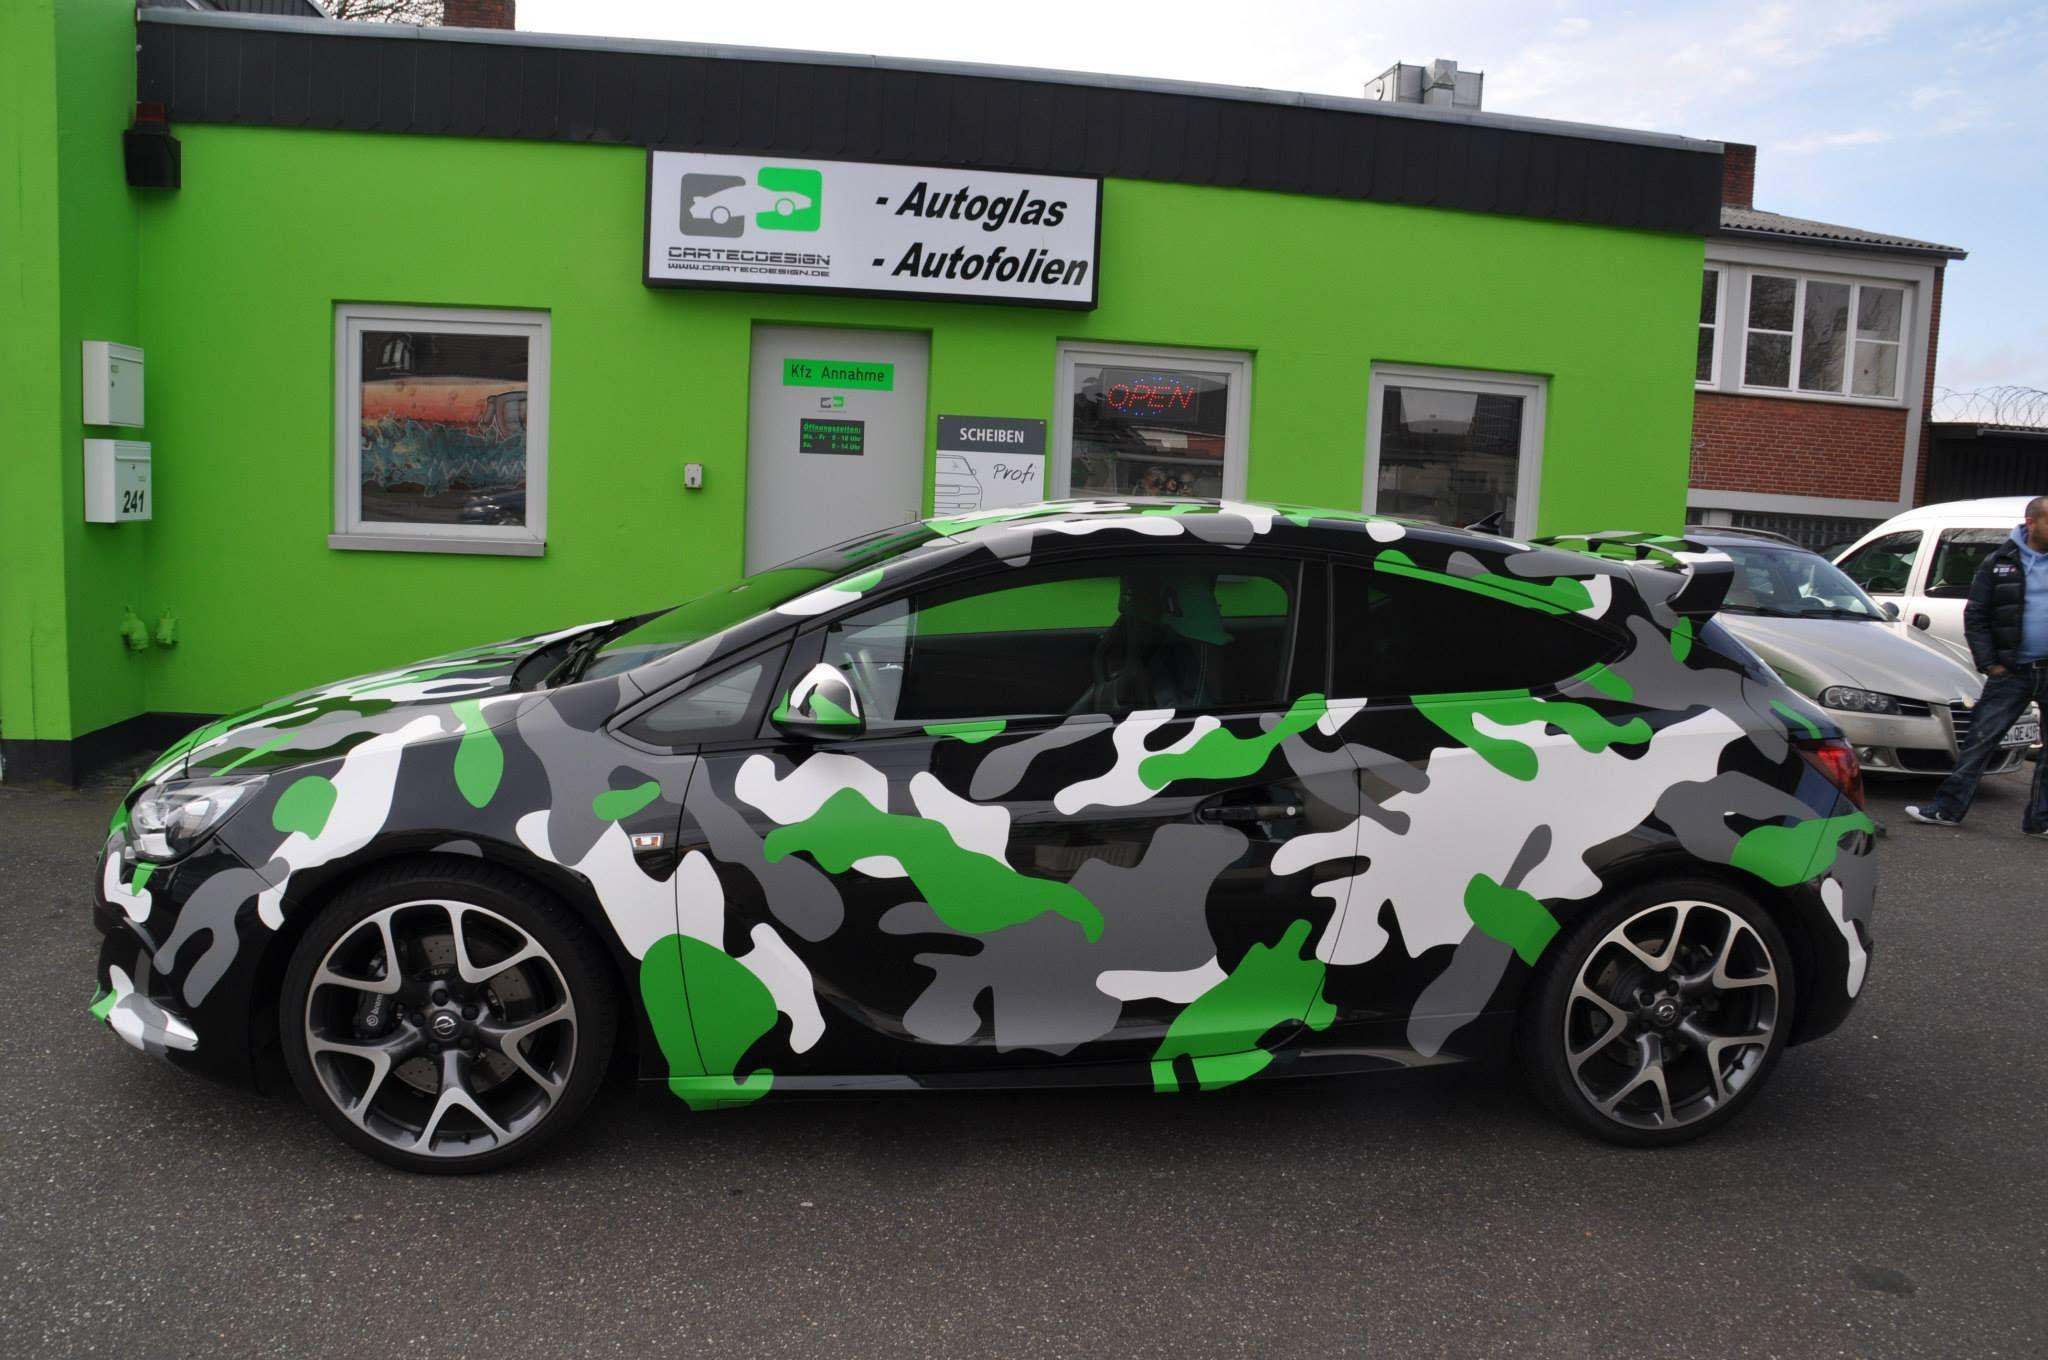 camouflage urbain vehicule - Buscar con Google